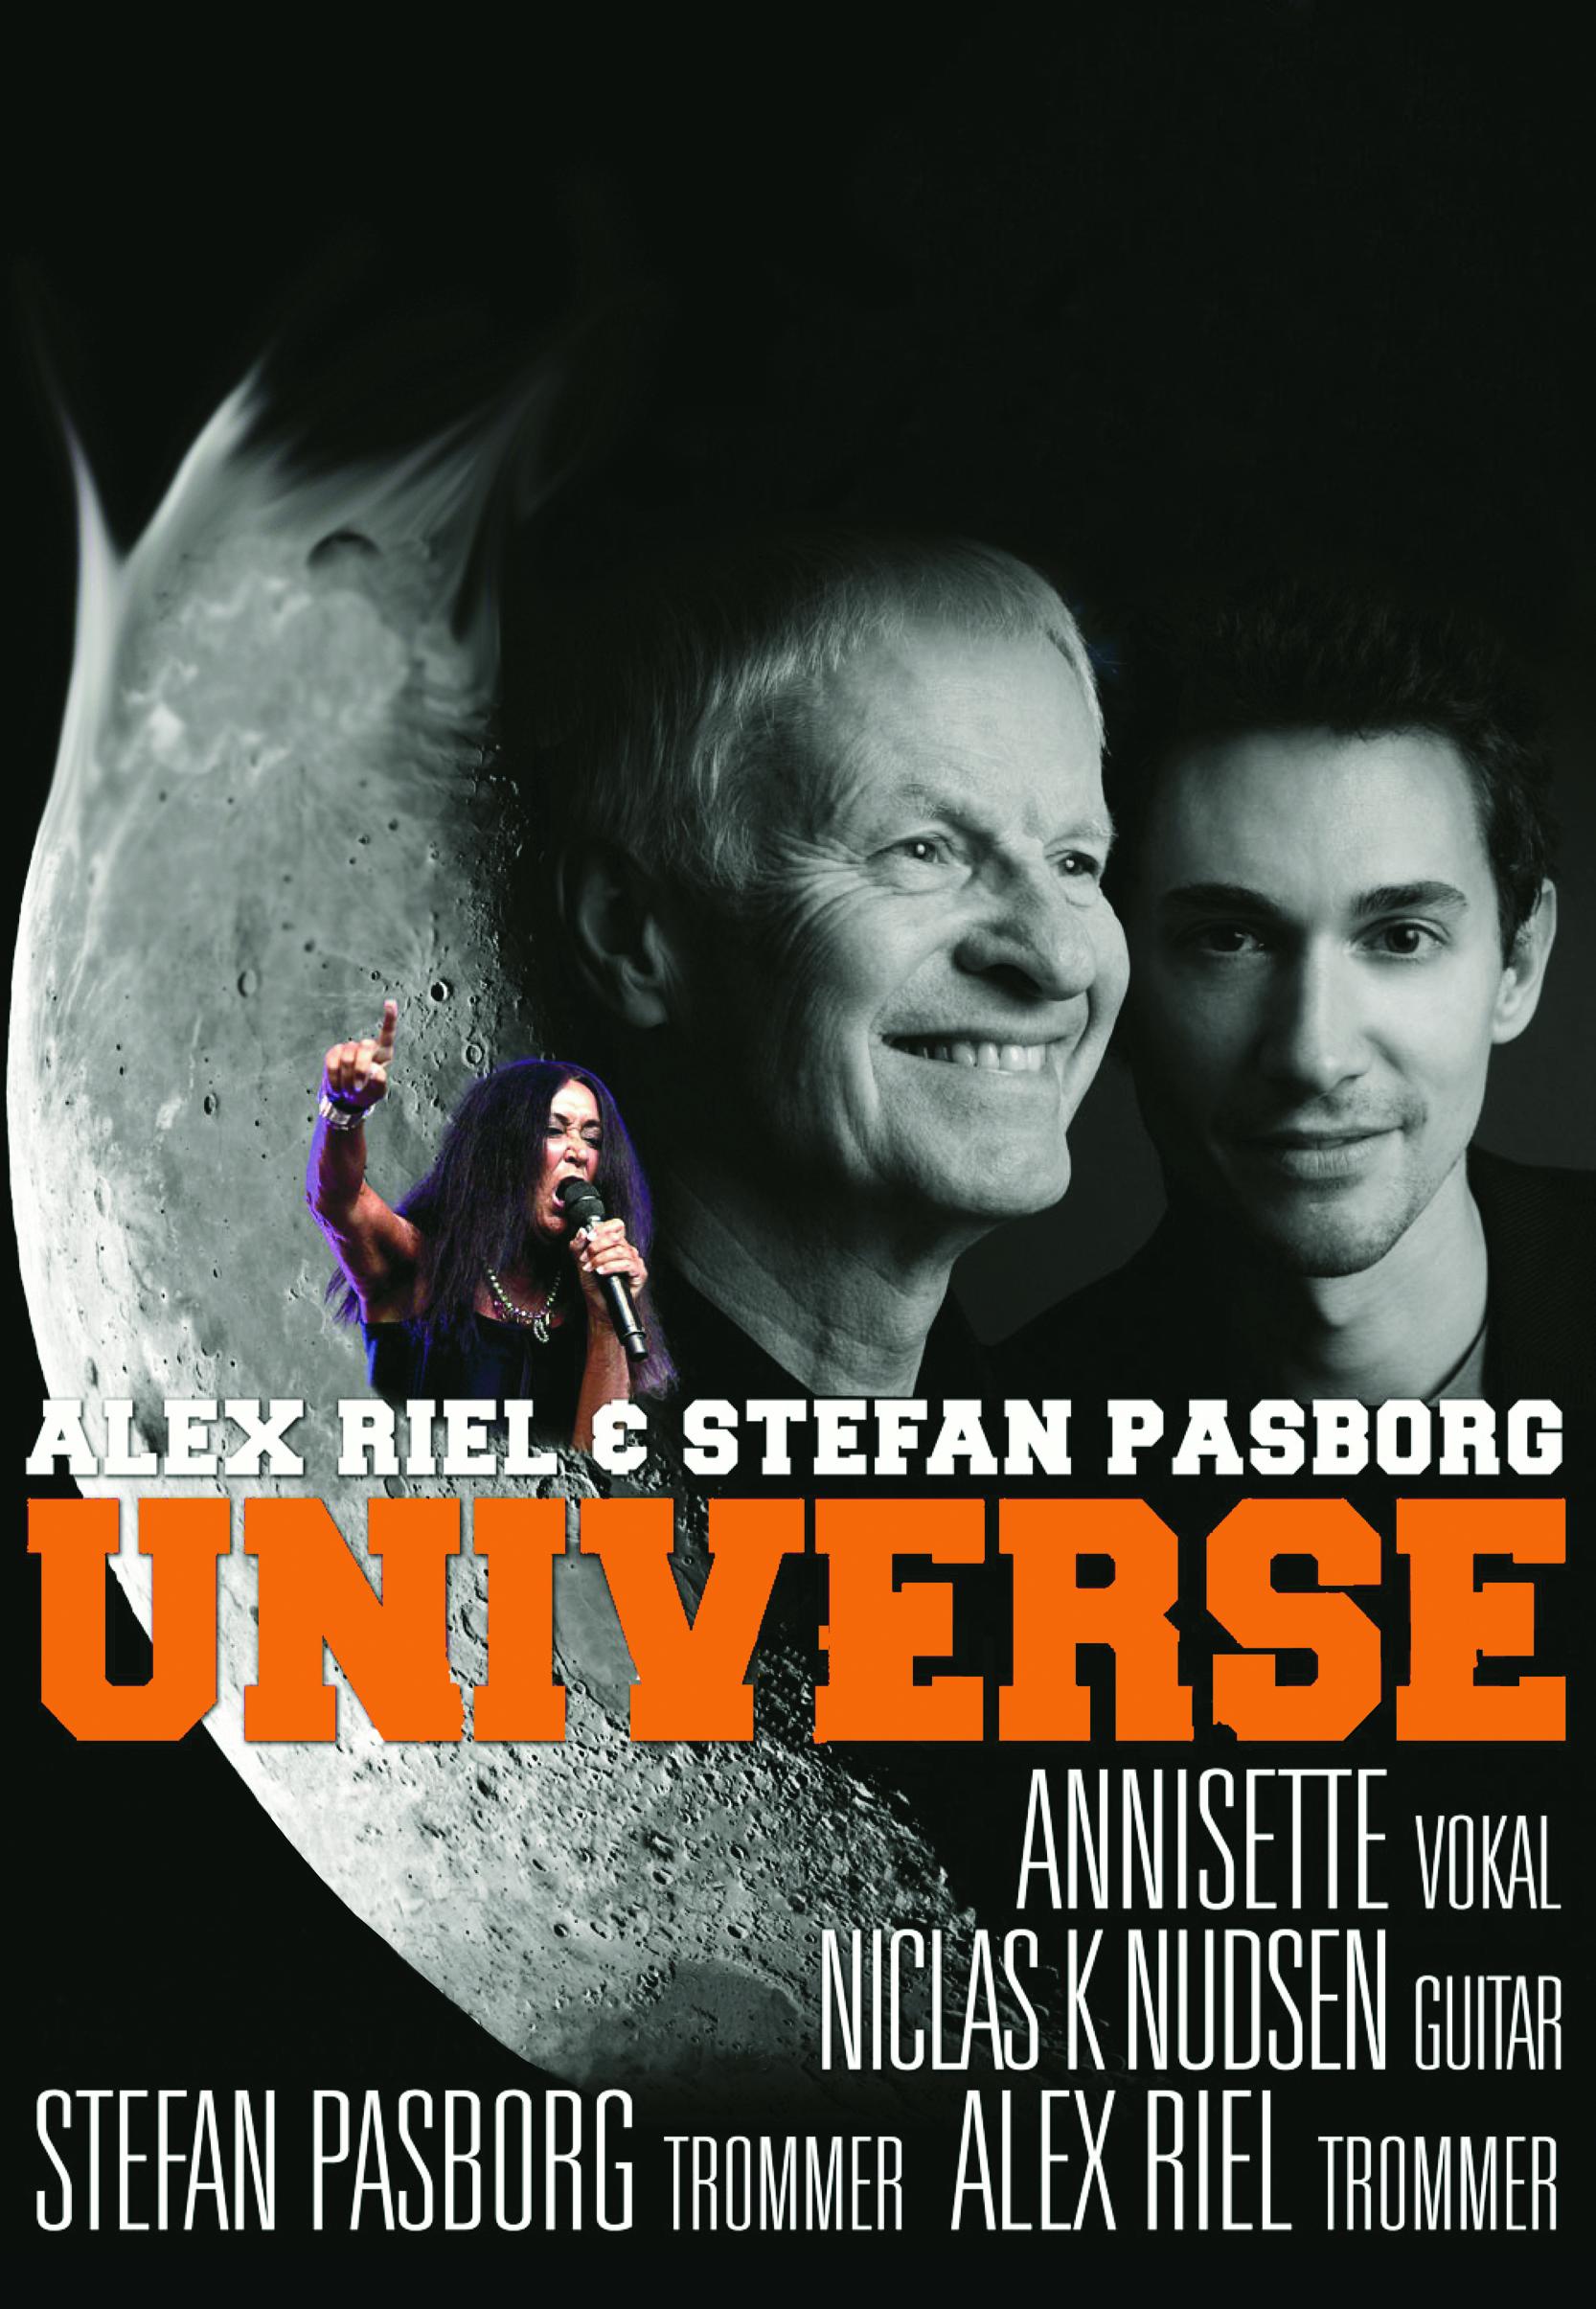 Alex-Riel-stefan-Padsborg-universe orange2